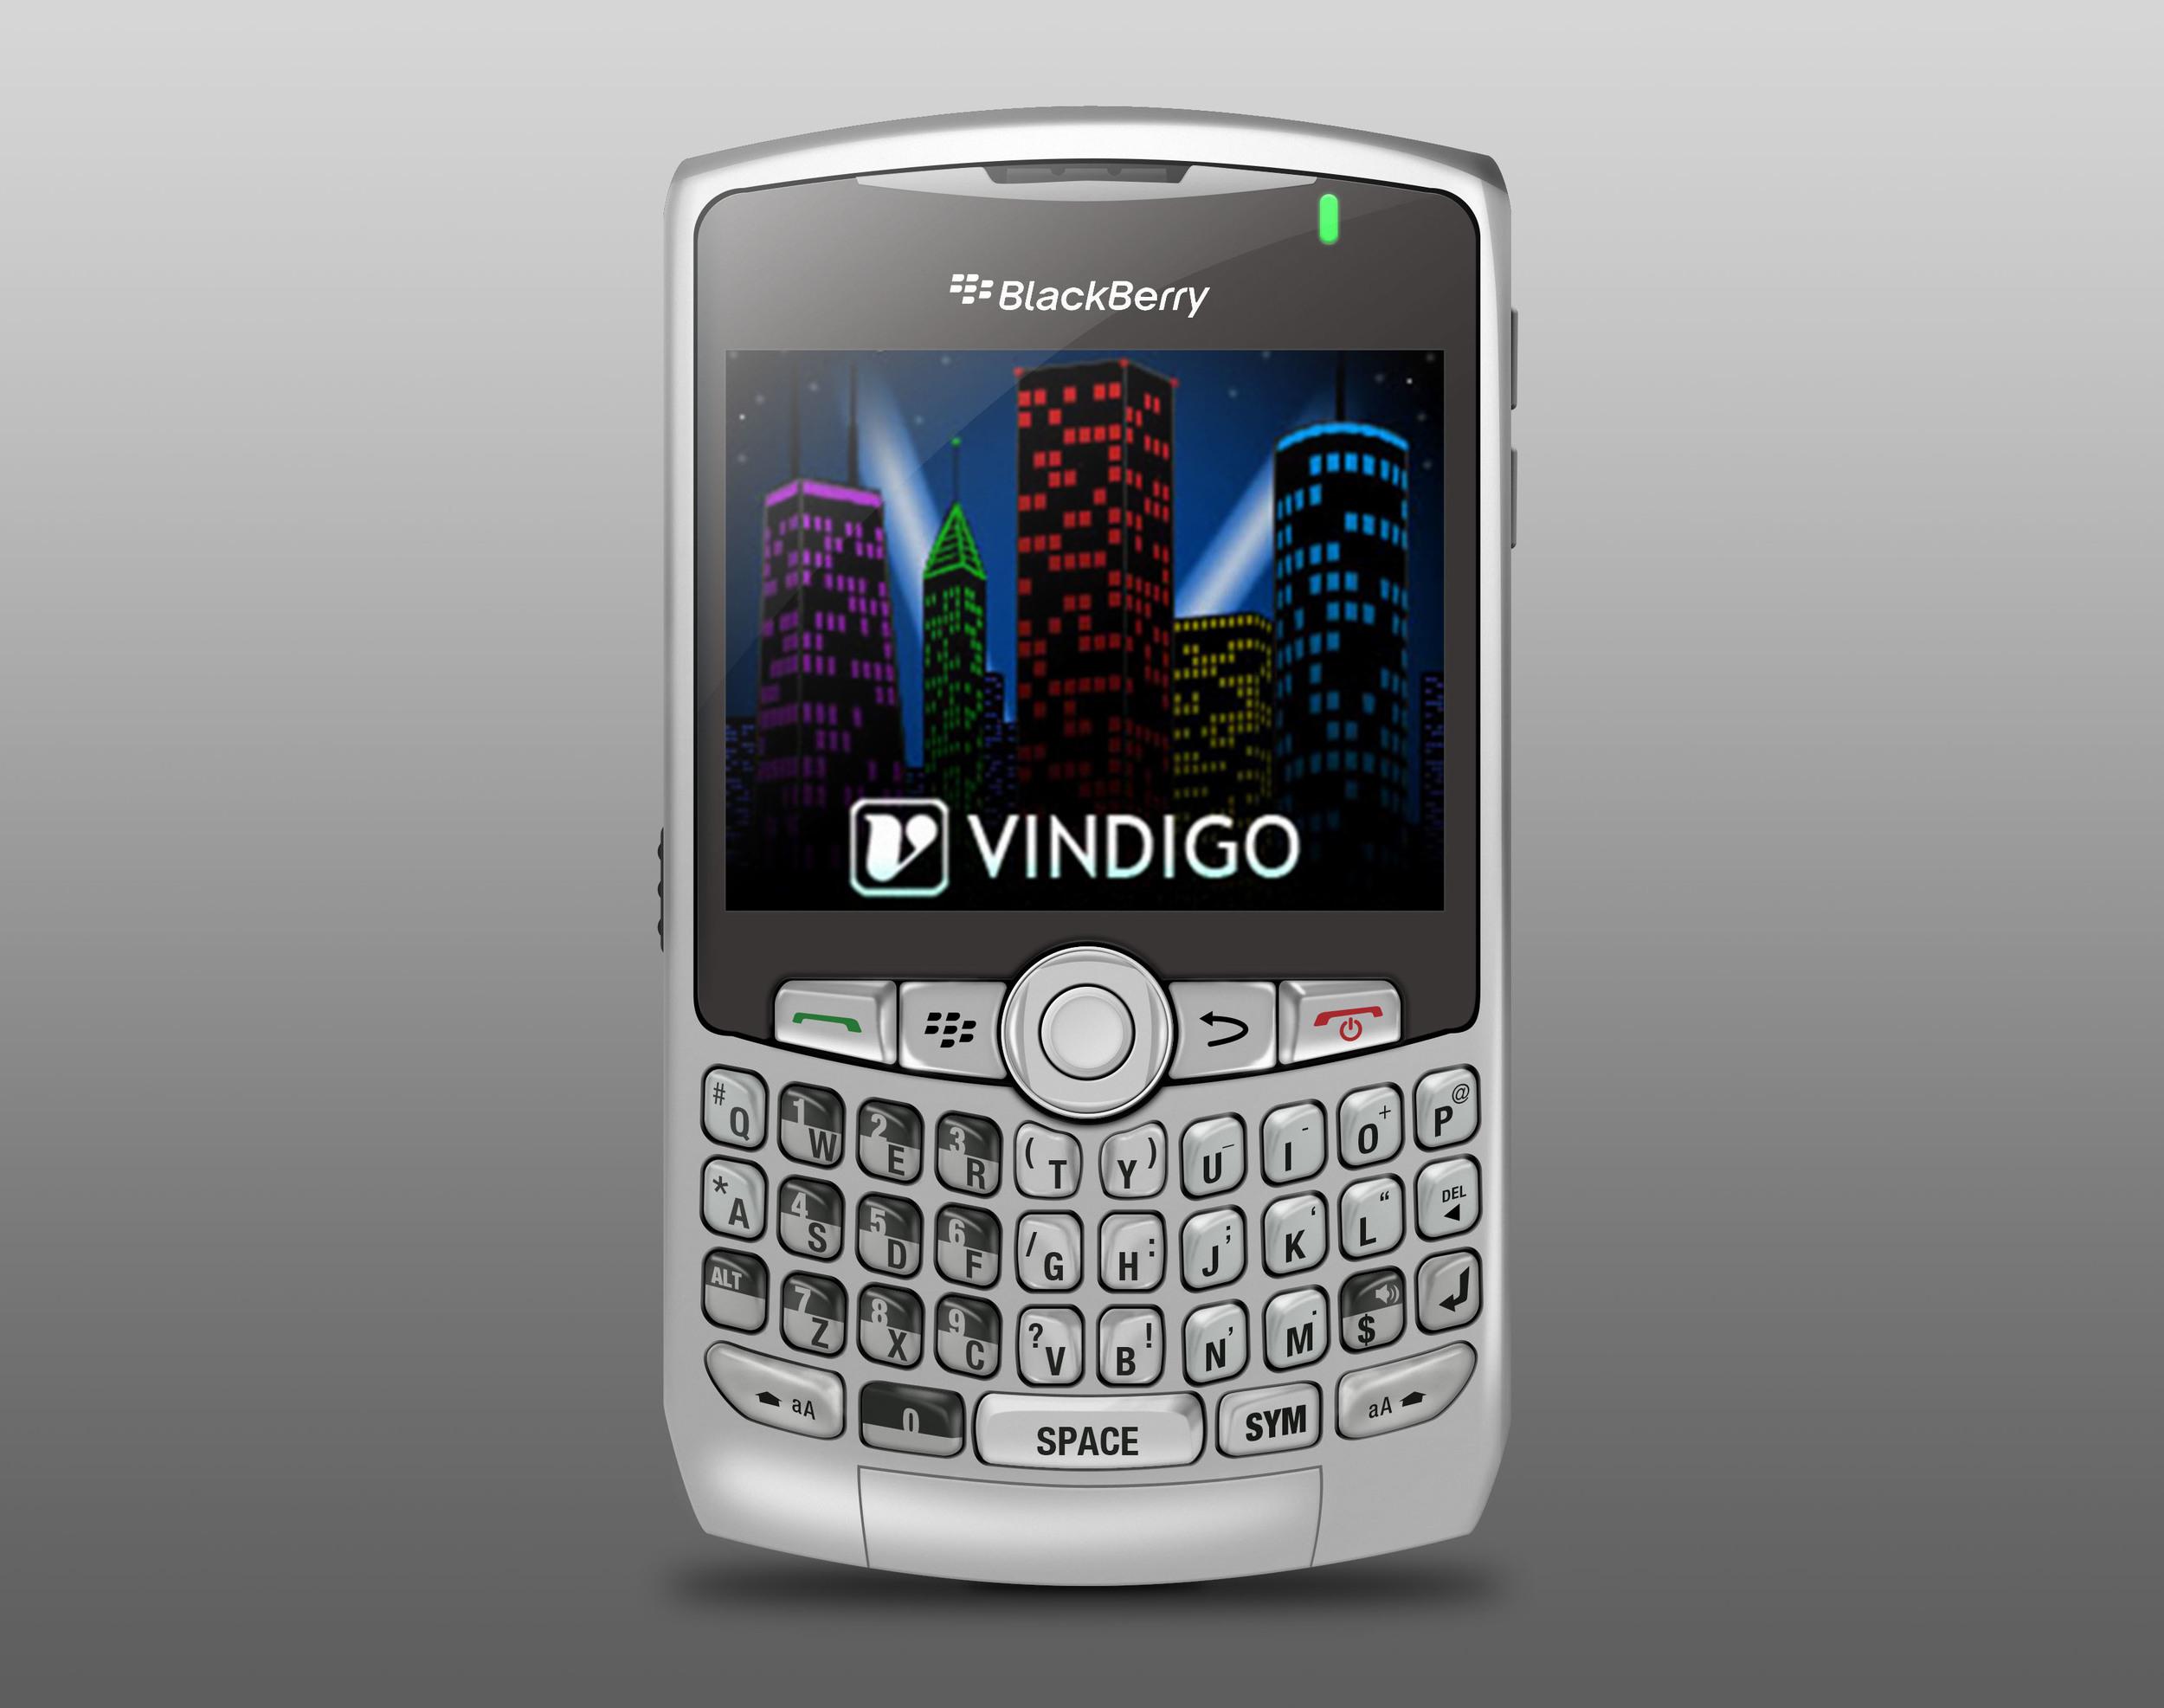 VINDIGO (2007-08)